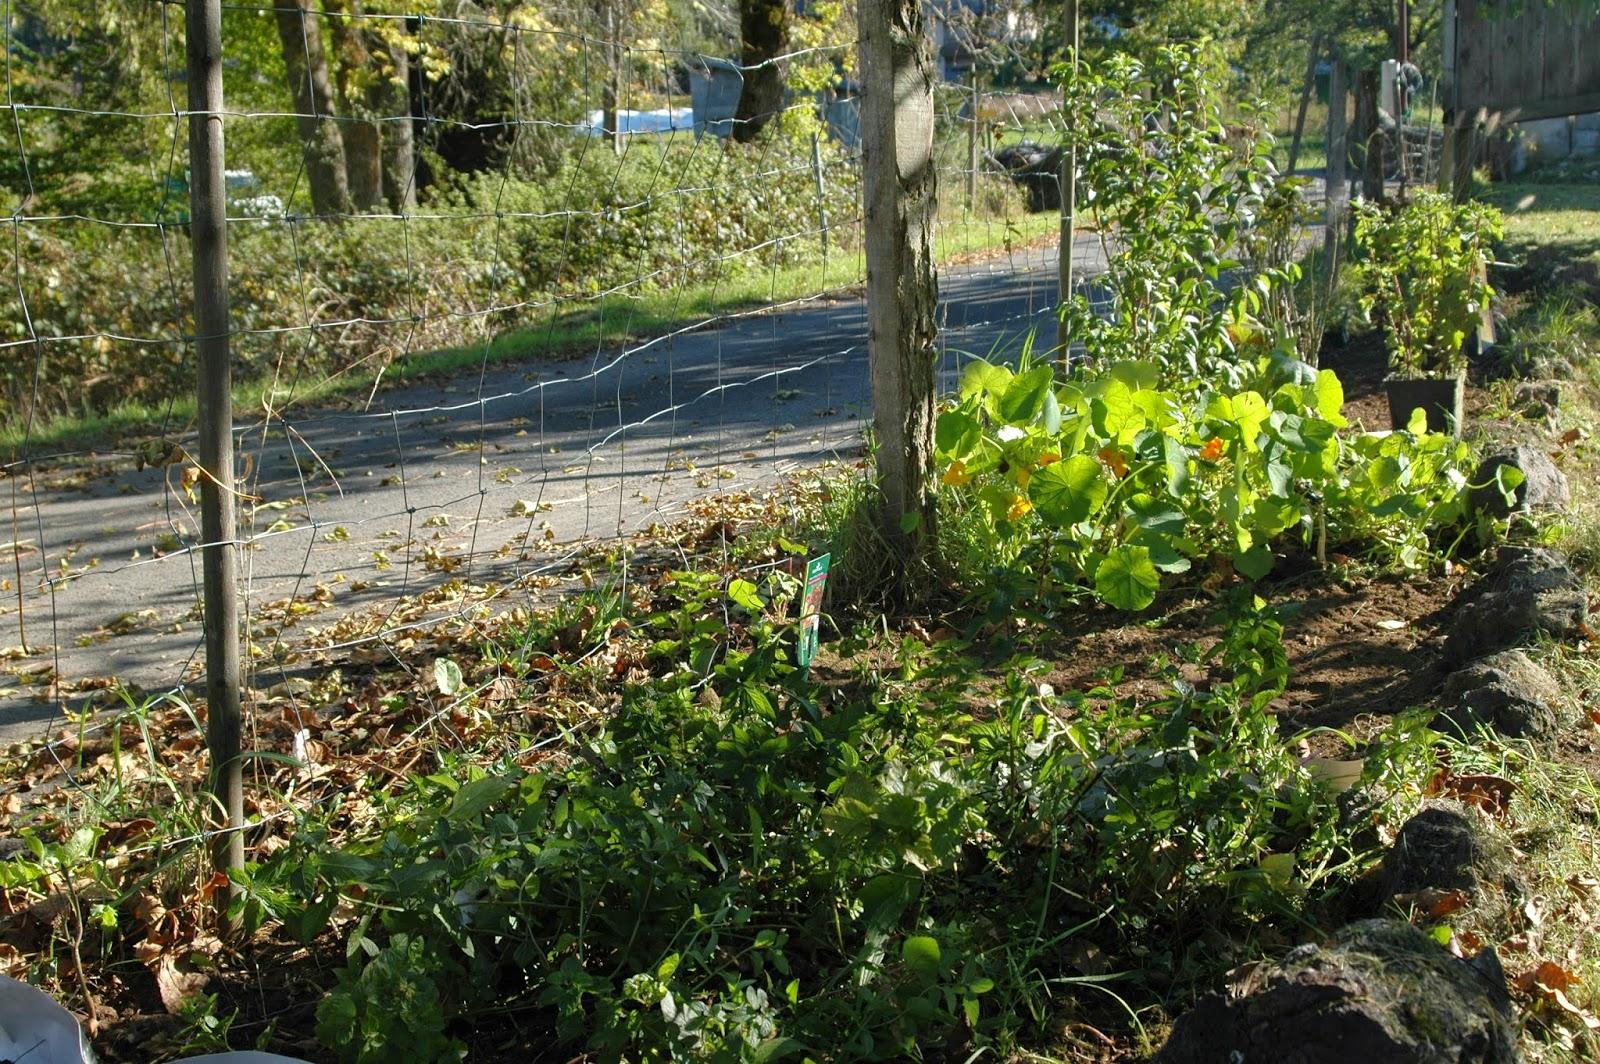 Ces doux moments un jardin extraordinaire for Jardin extraordinaire 2015 lieurac